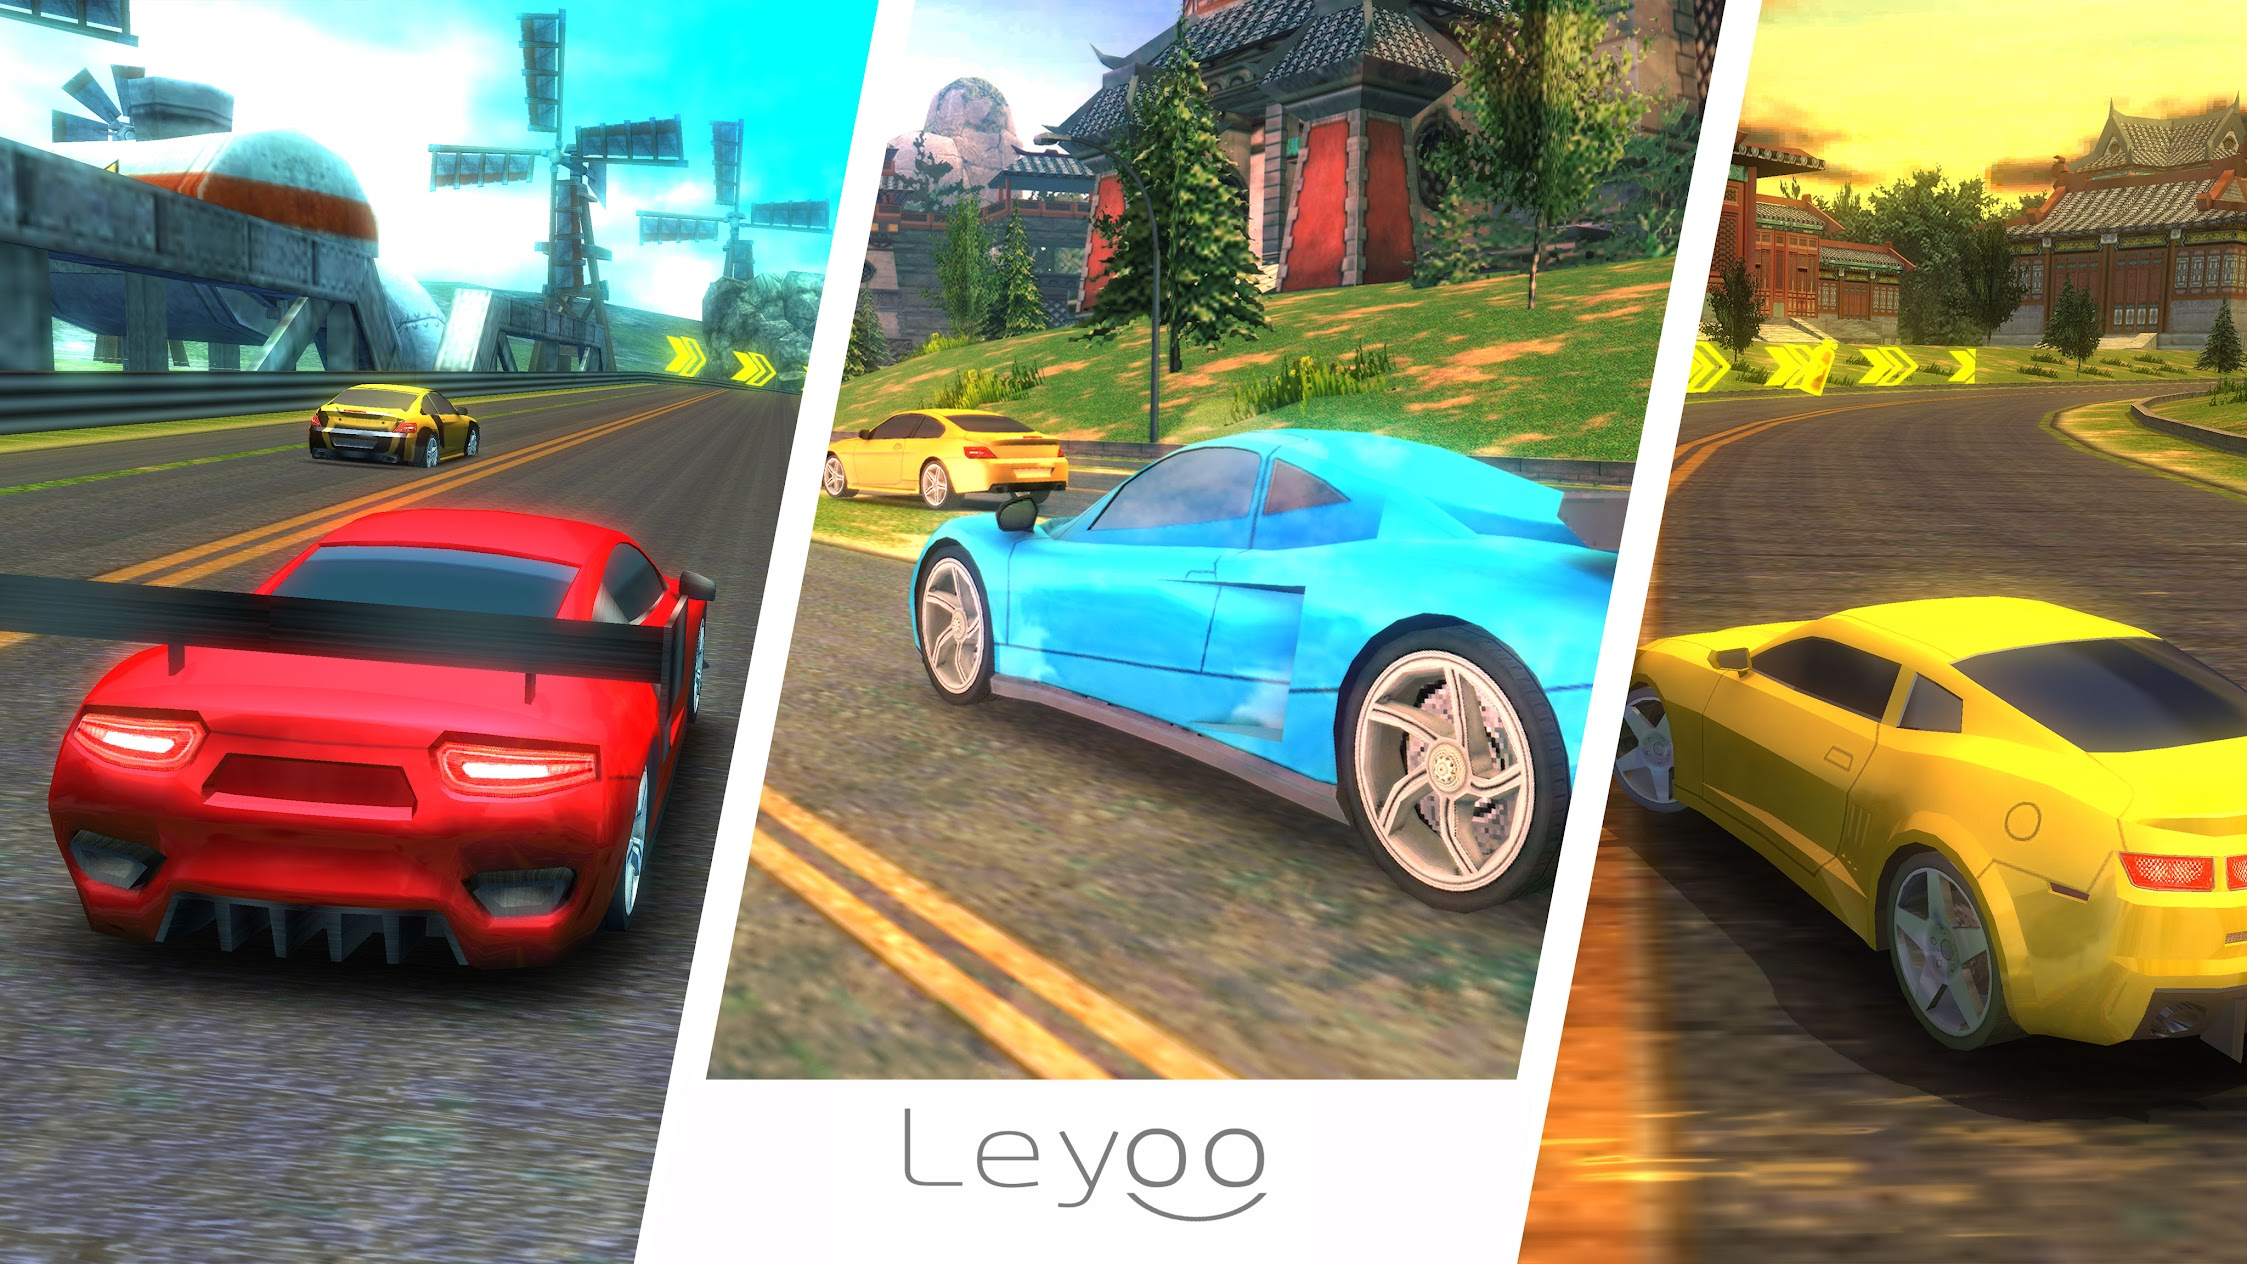 LeYoo,Inc.